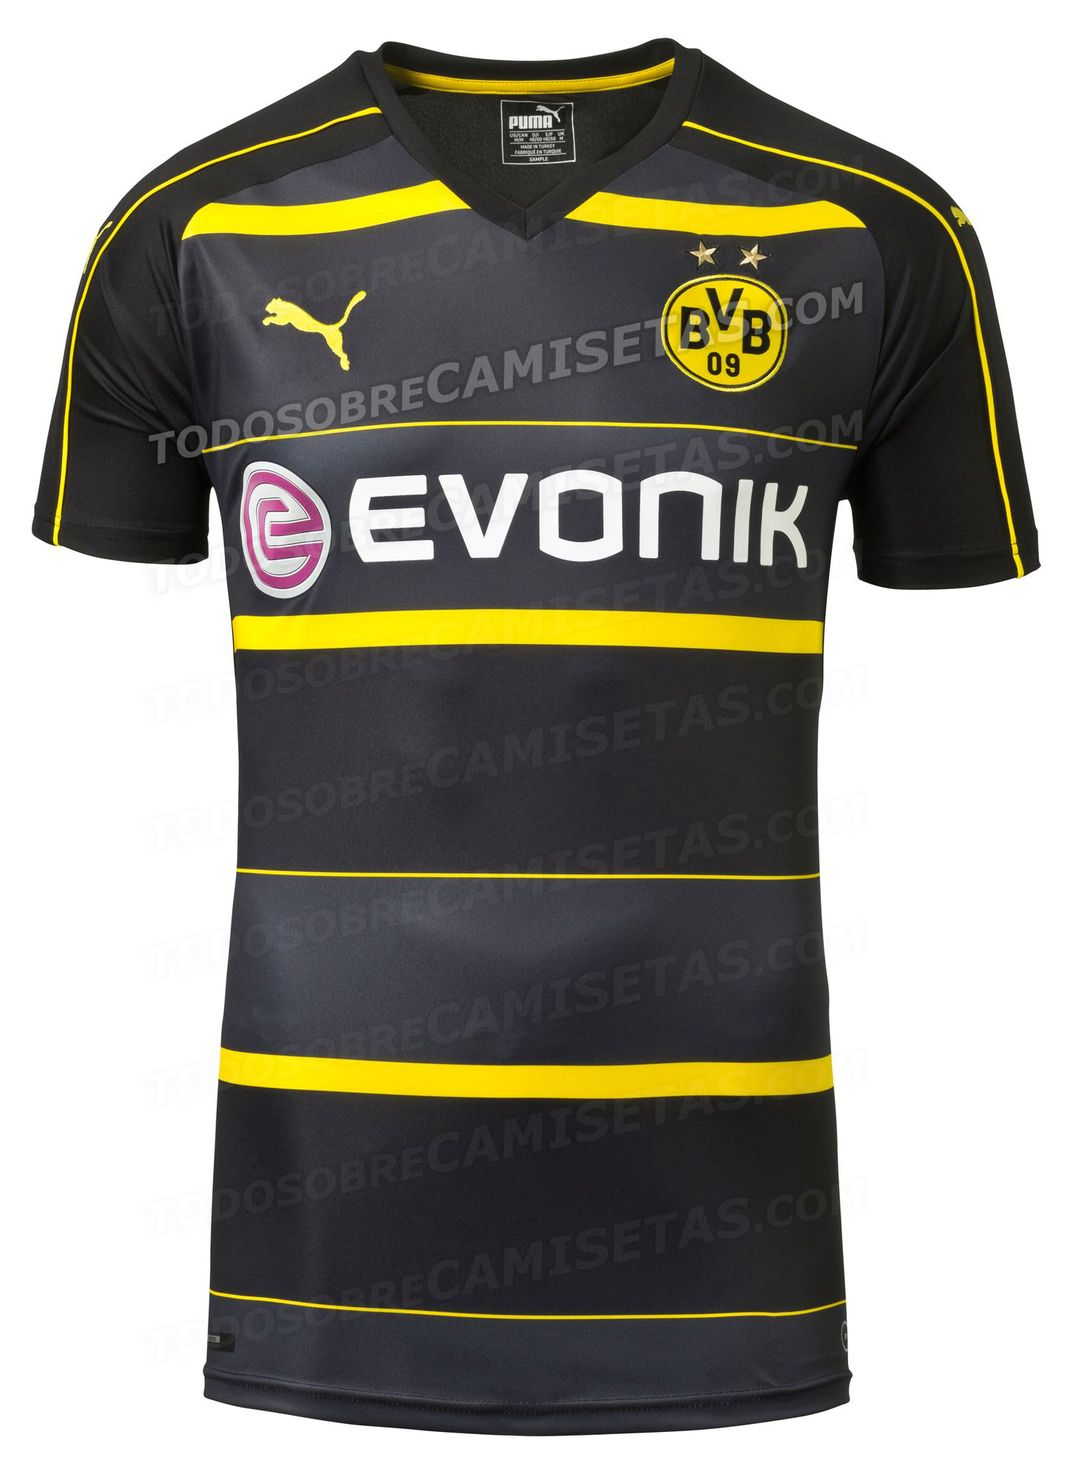 Borussia Dortmund 16 17 Puma away kit LEAKED